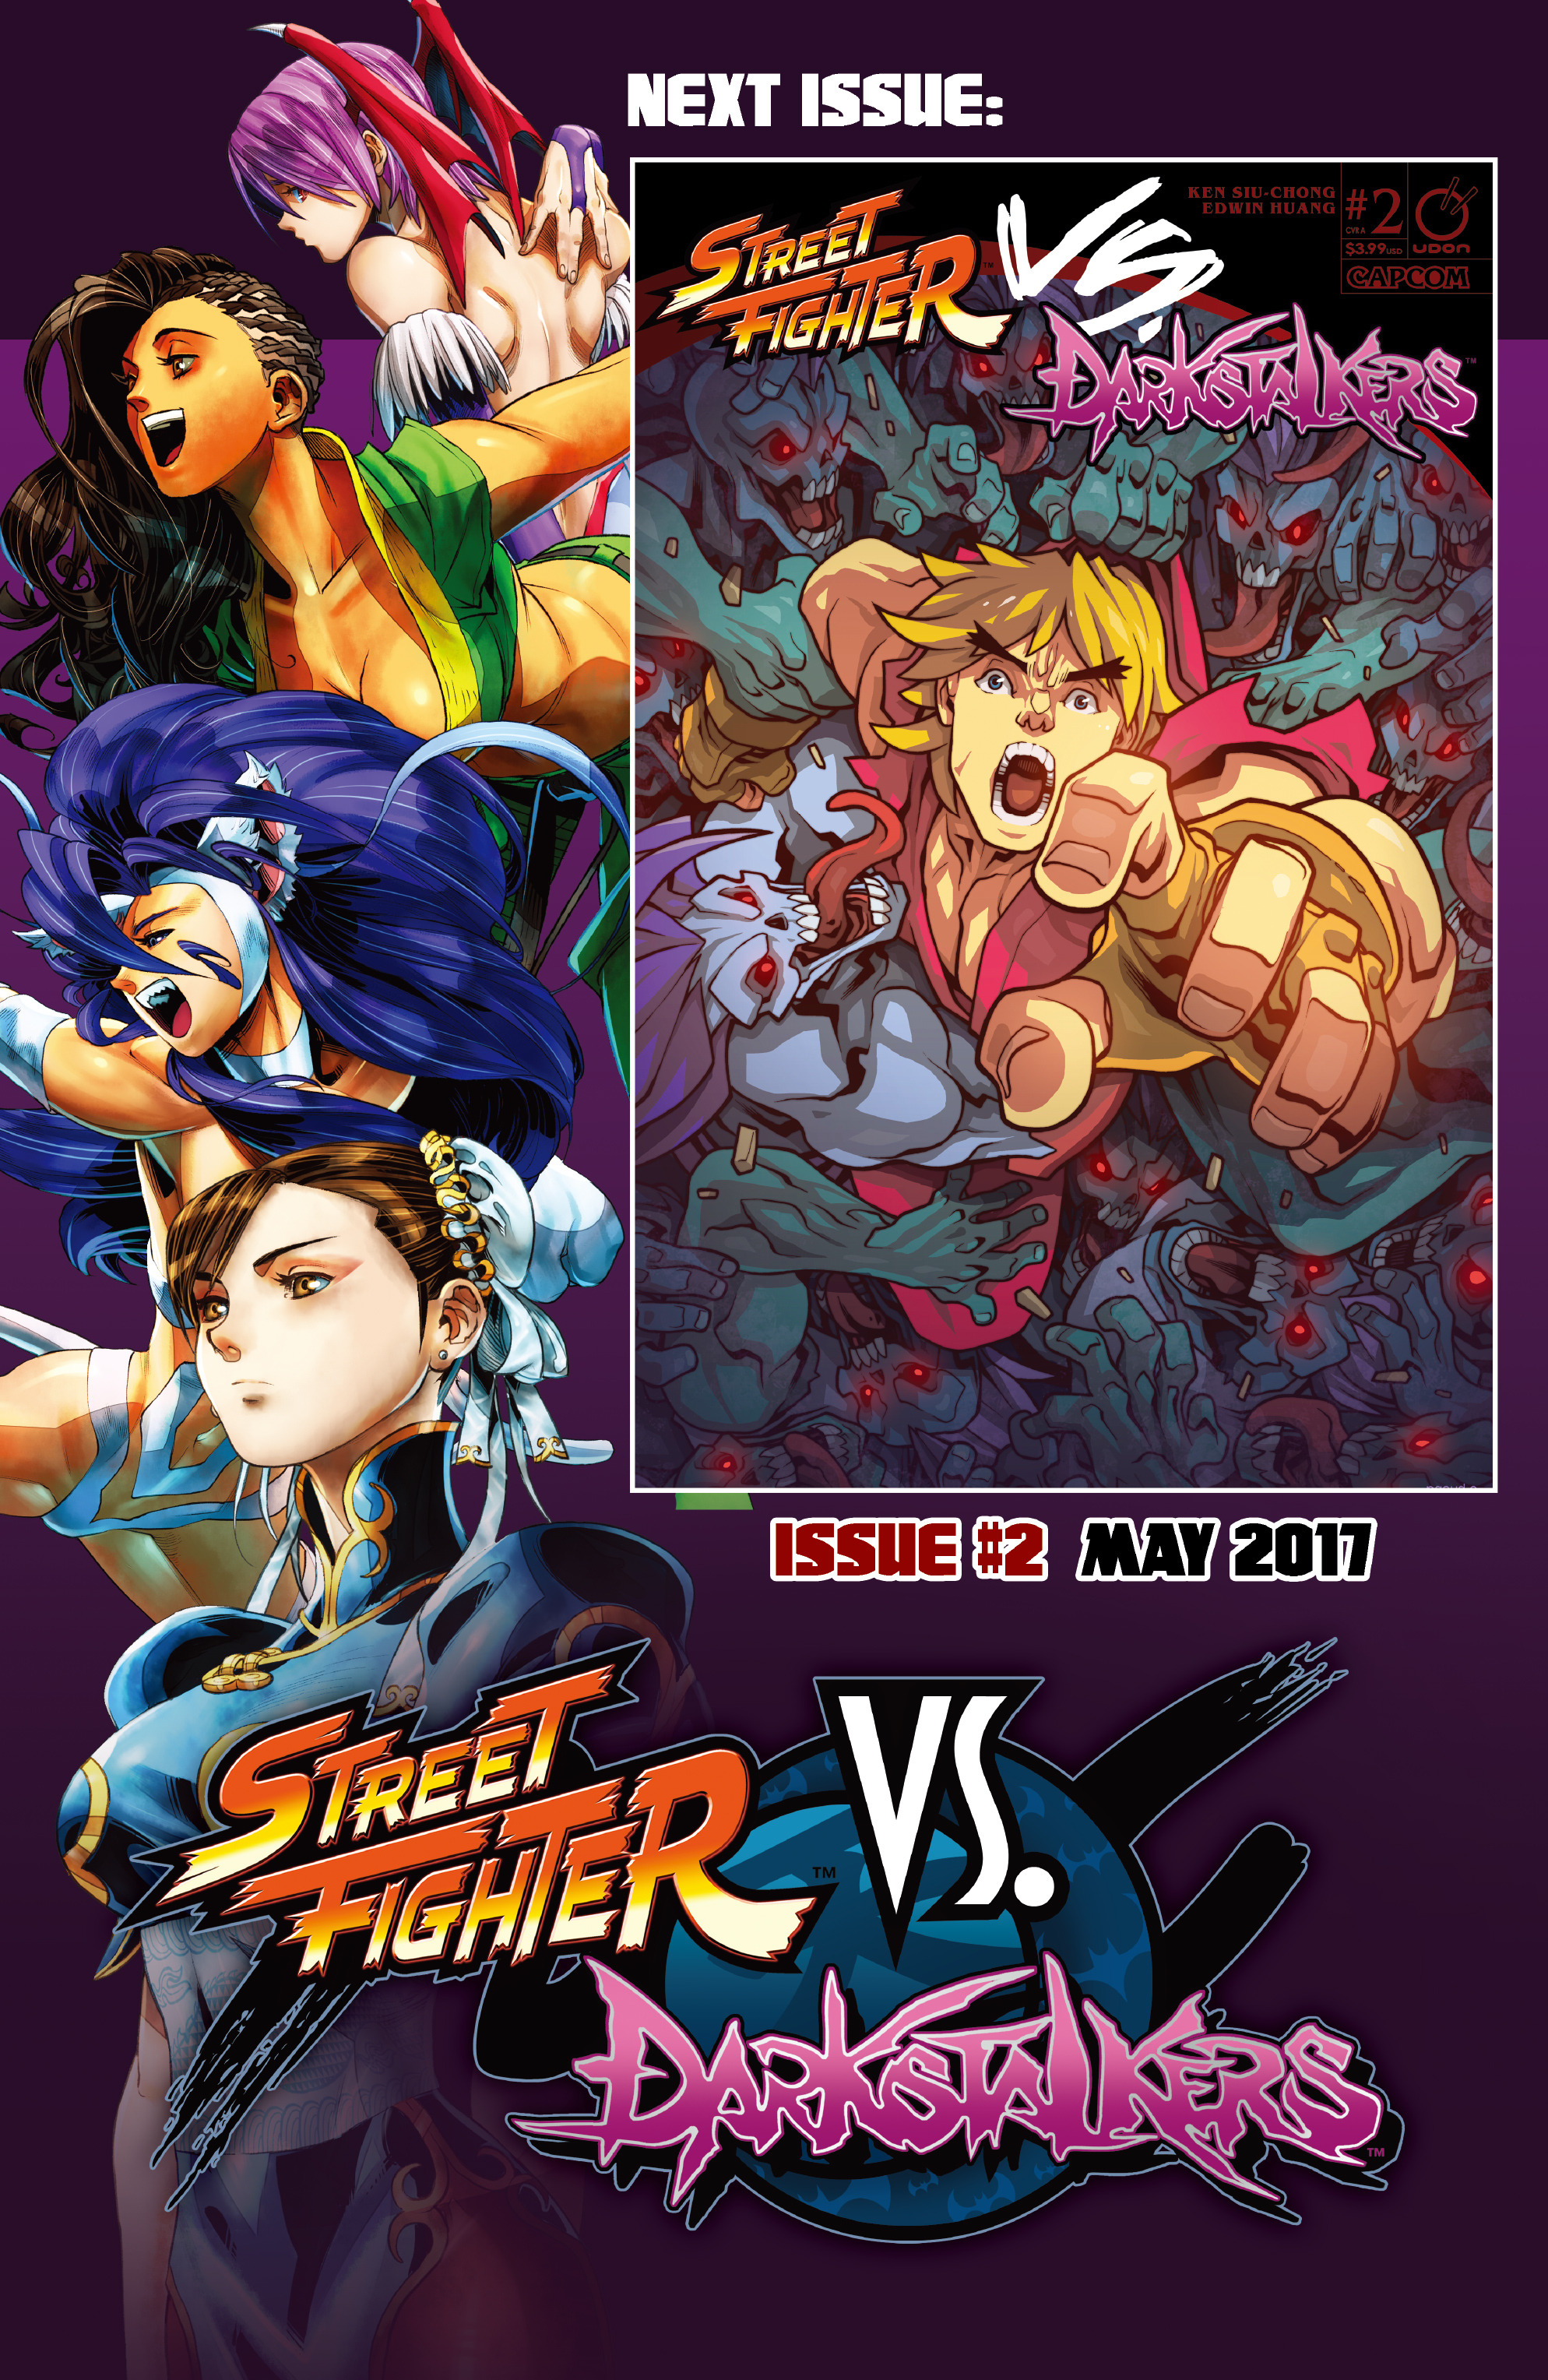 Read online Street Fighter VS Darkstalkers comic -  Issue #1 - 24